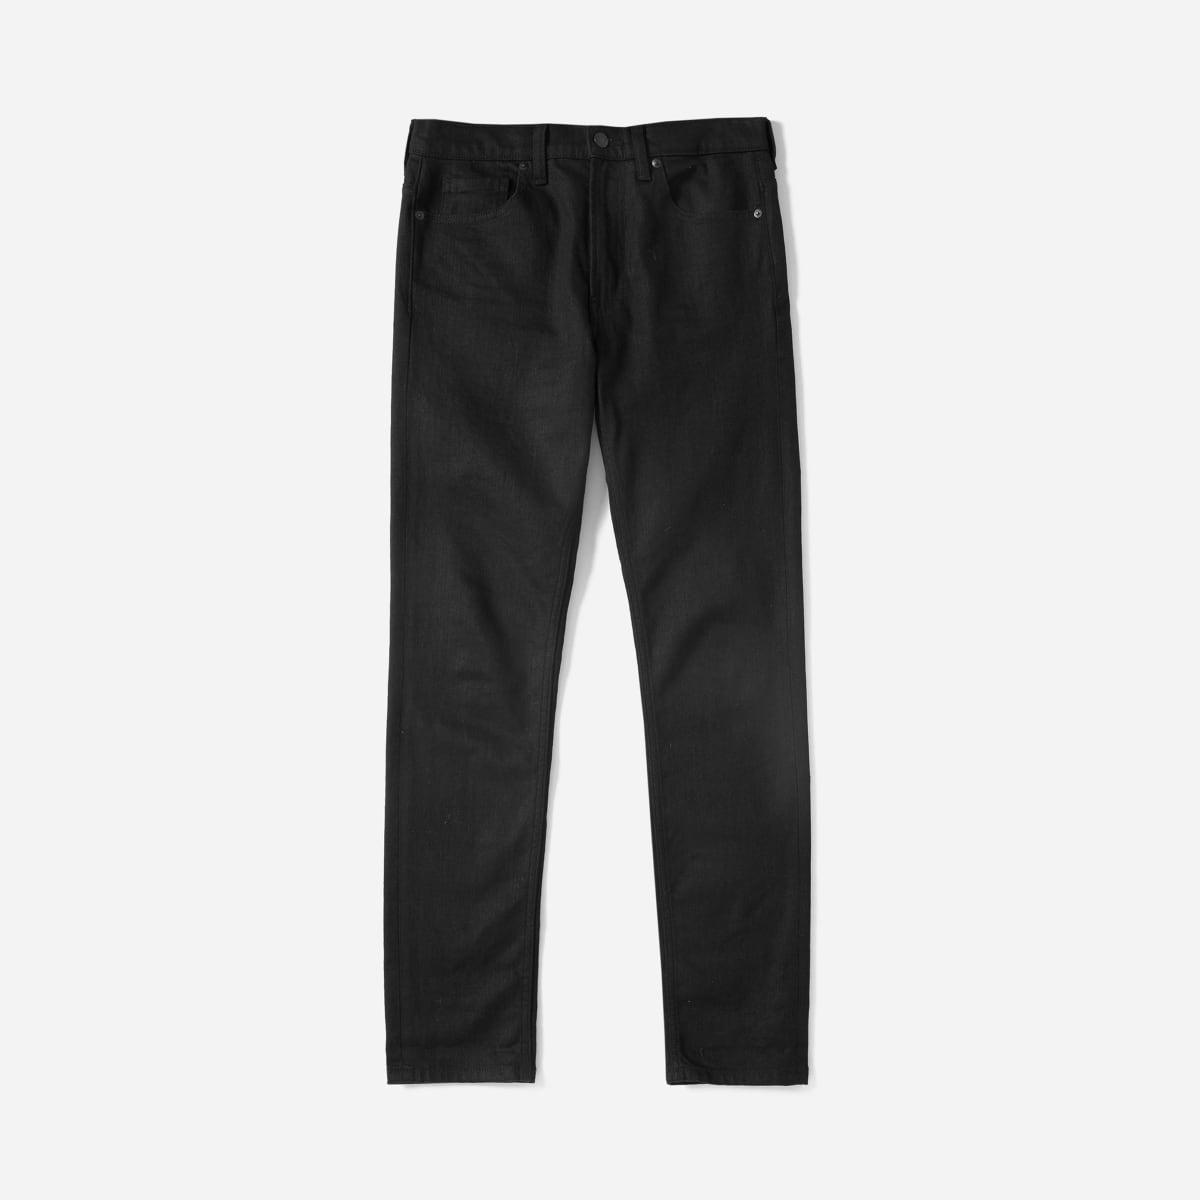 Everlane Slim Fit Jeans